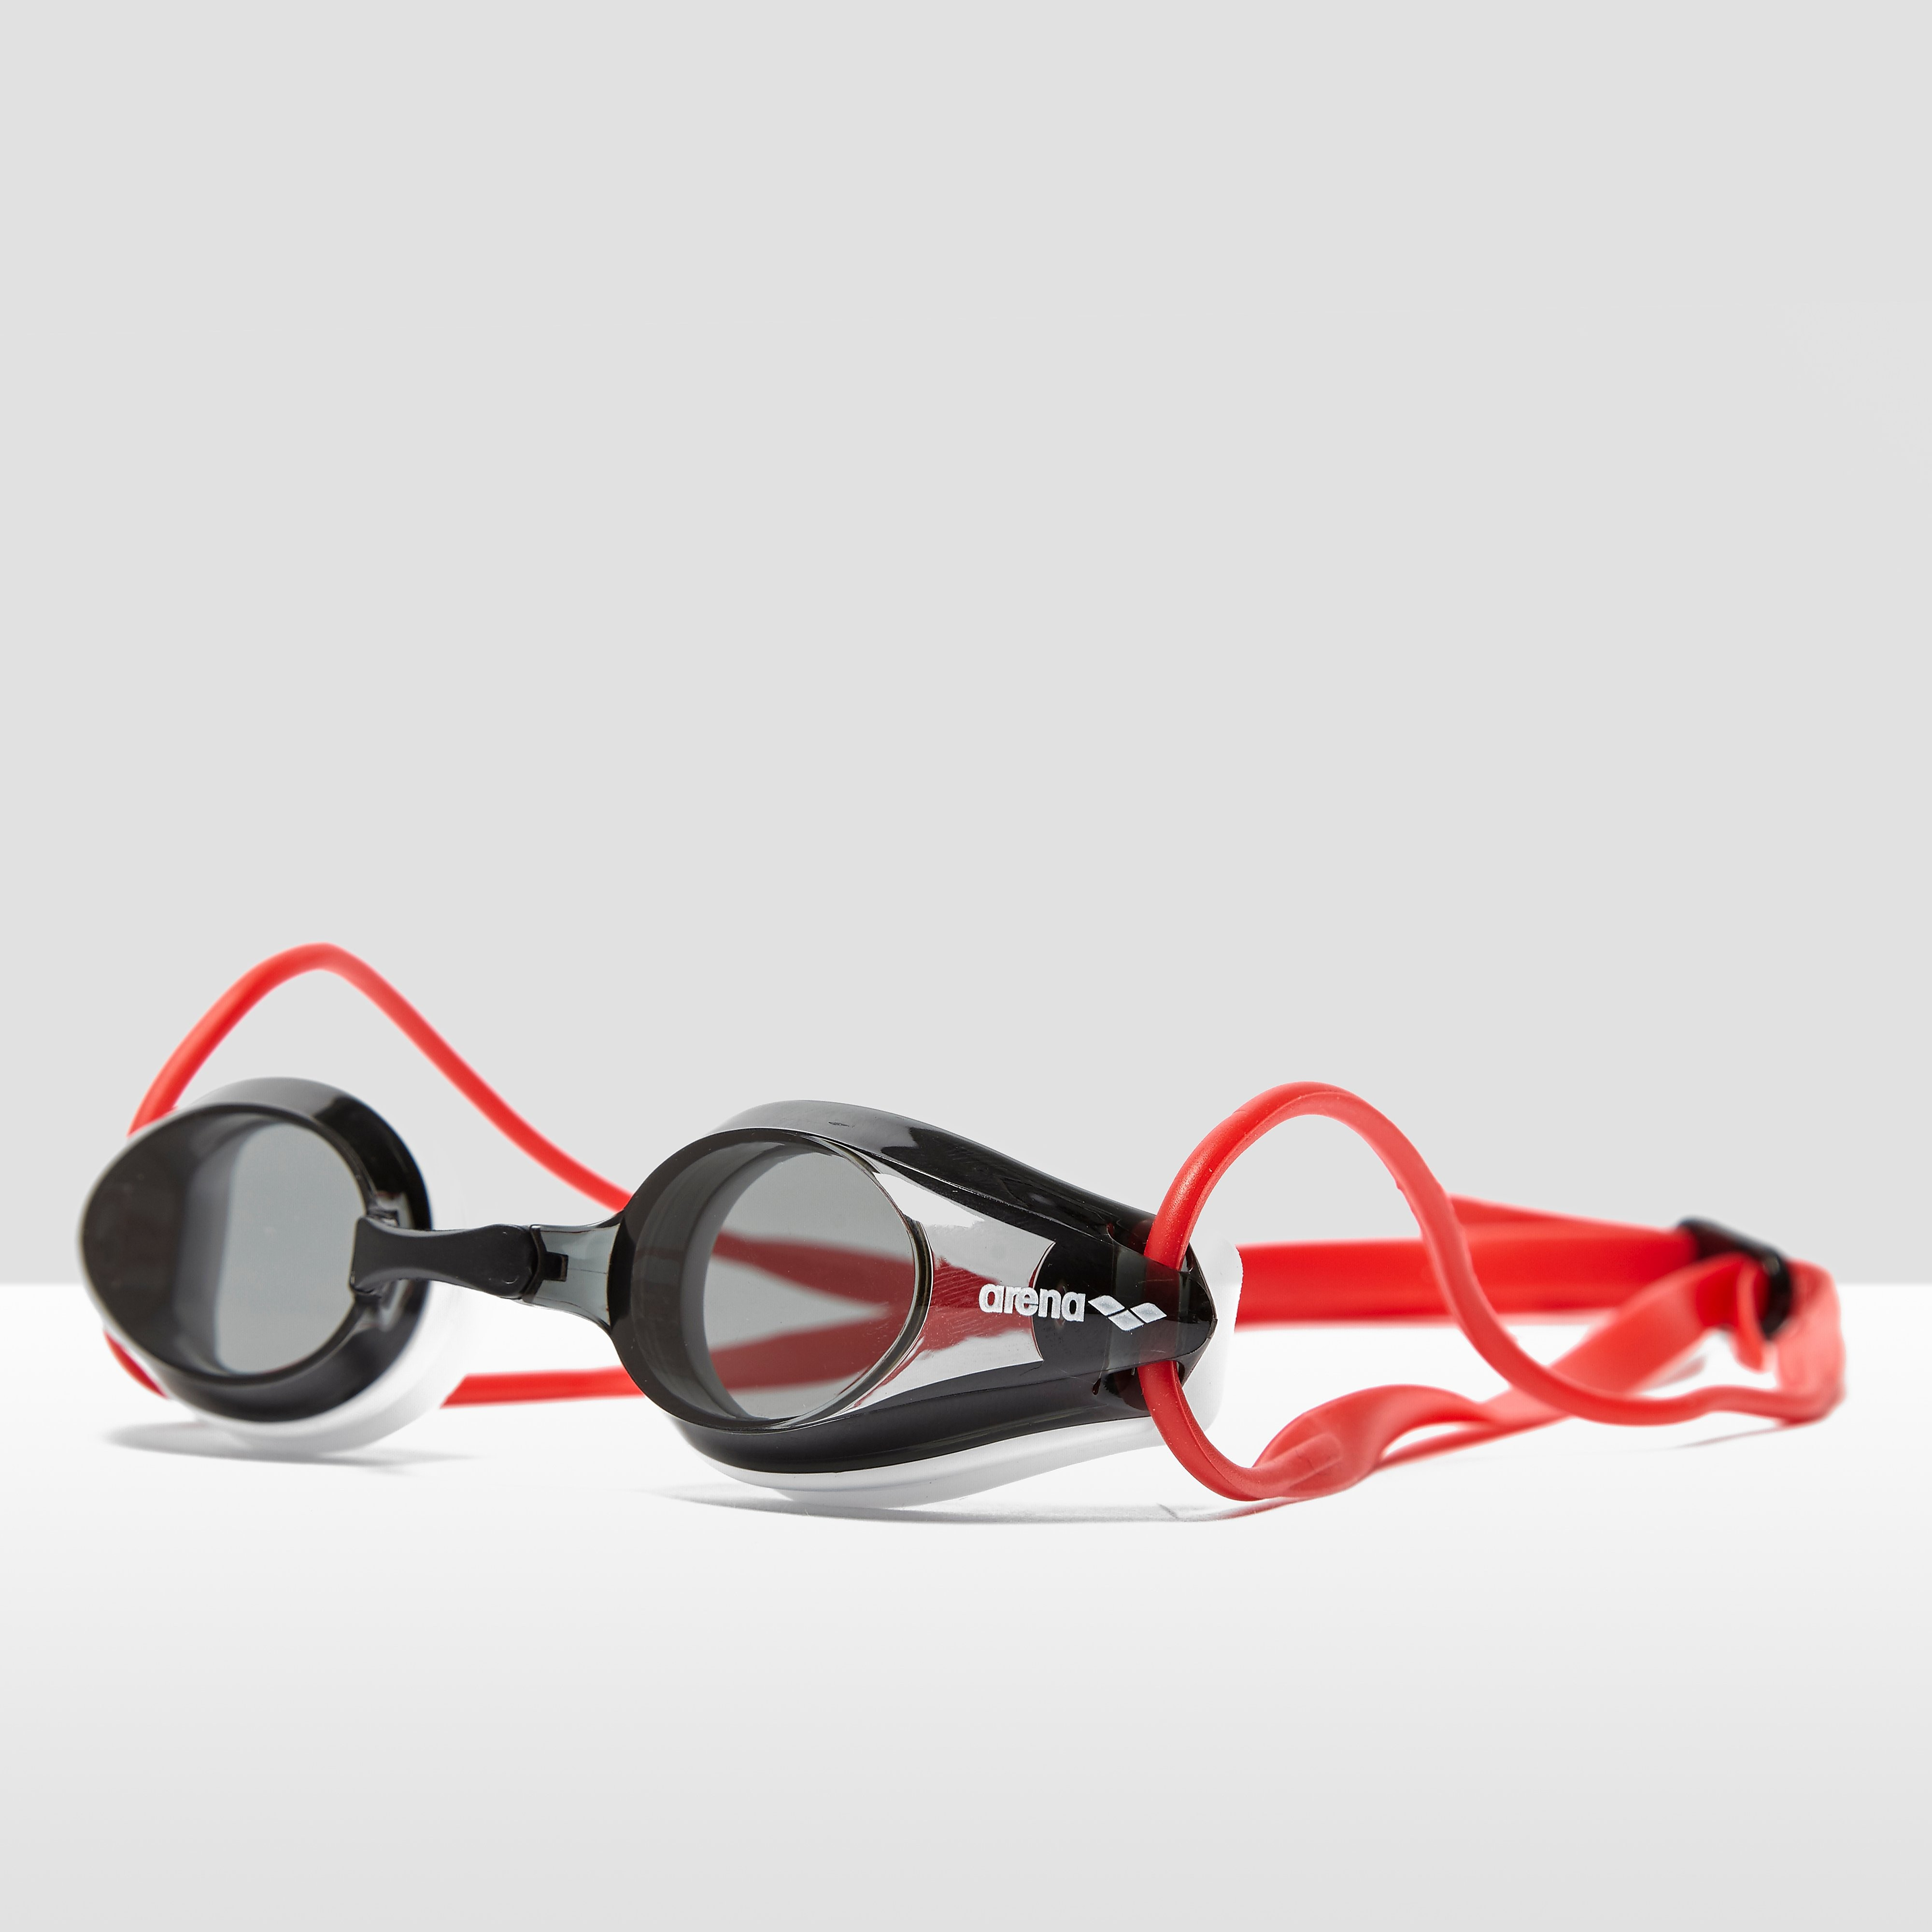 Arena Tracks Junior Goggles